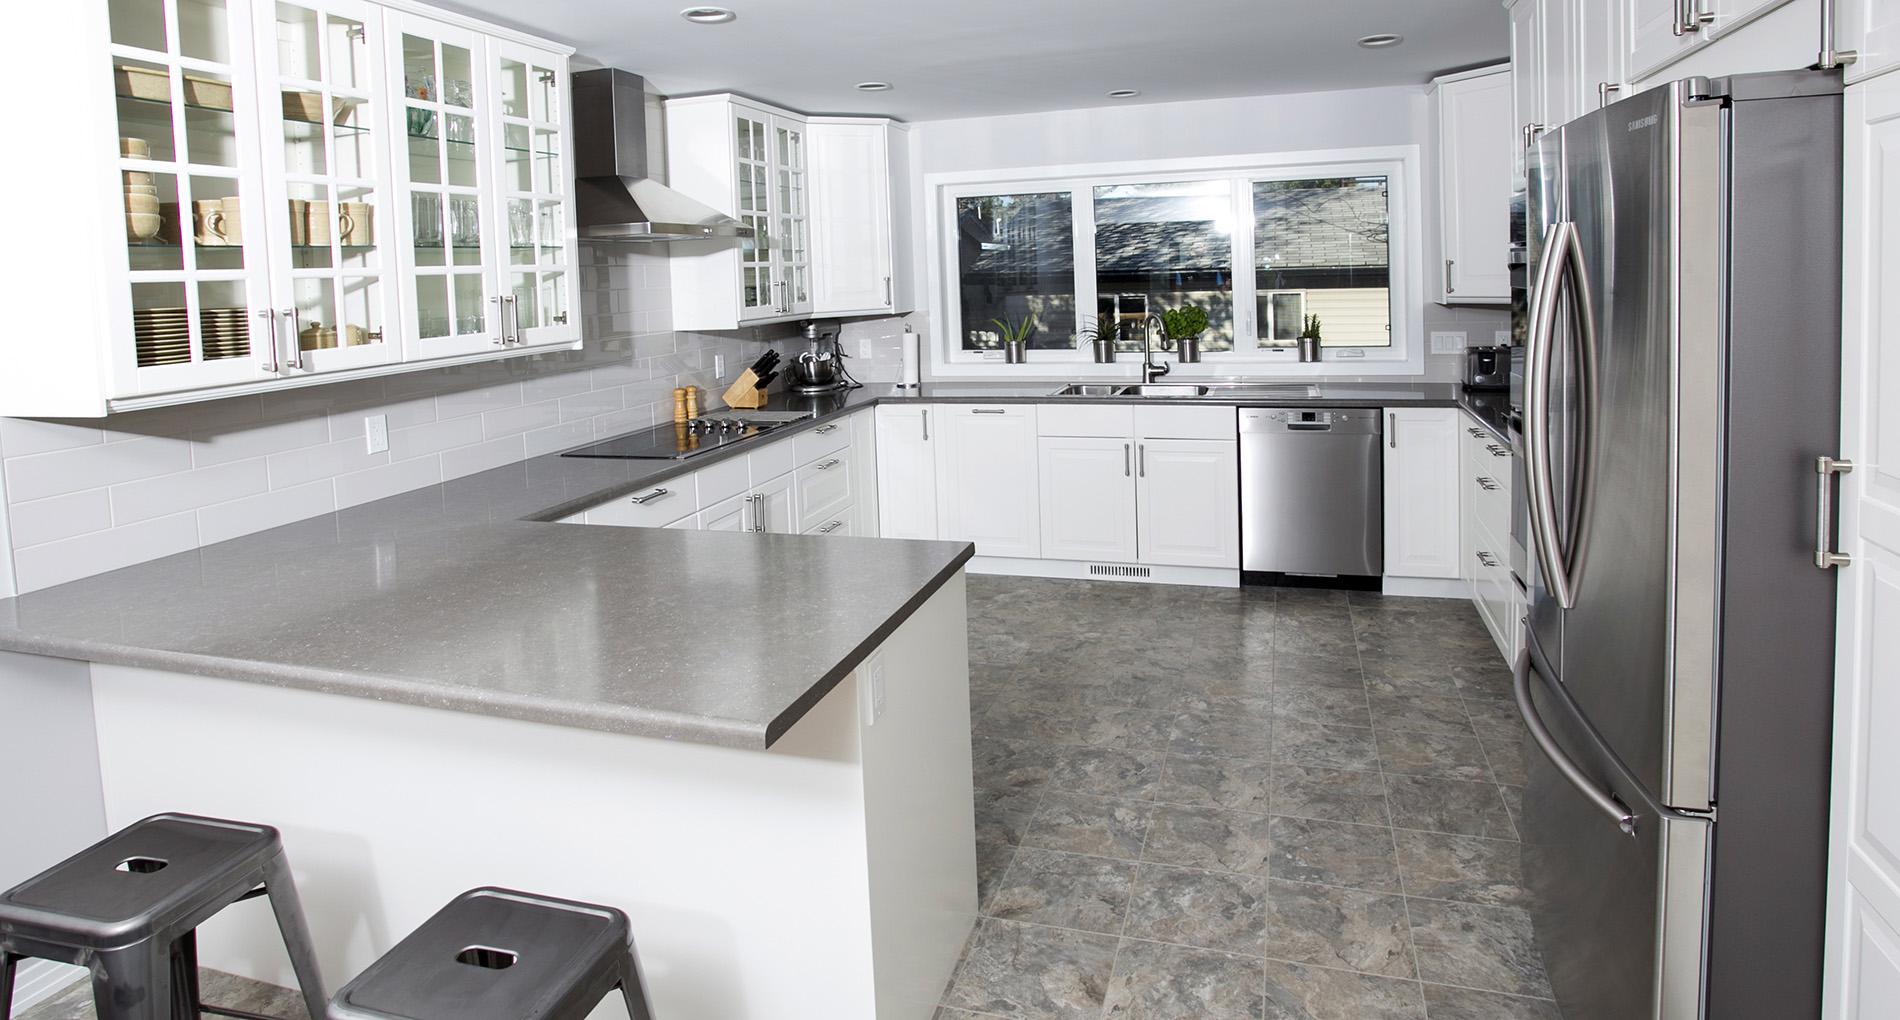 bradford-home-addition